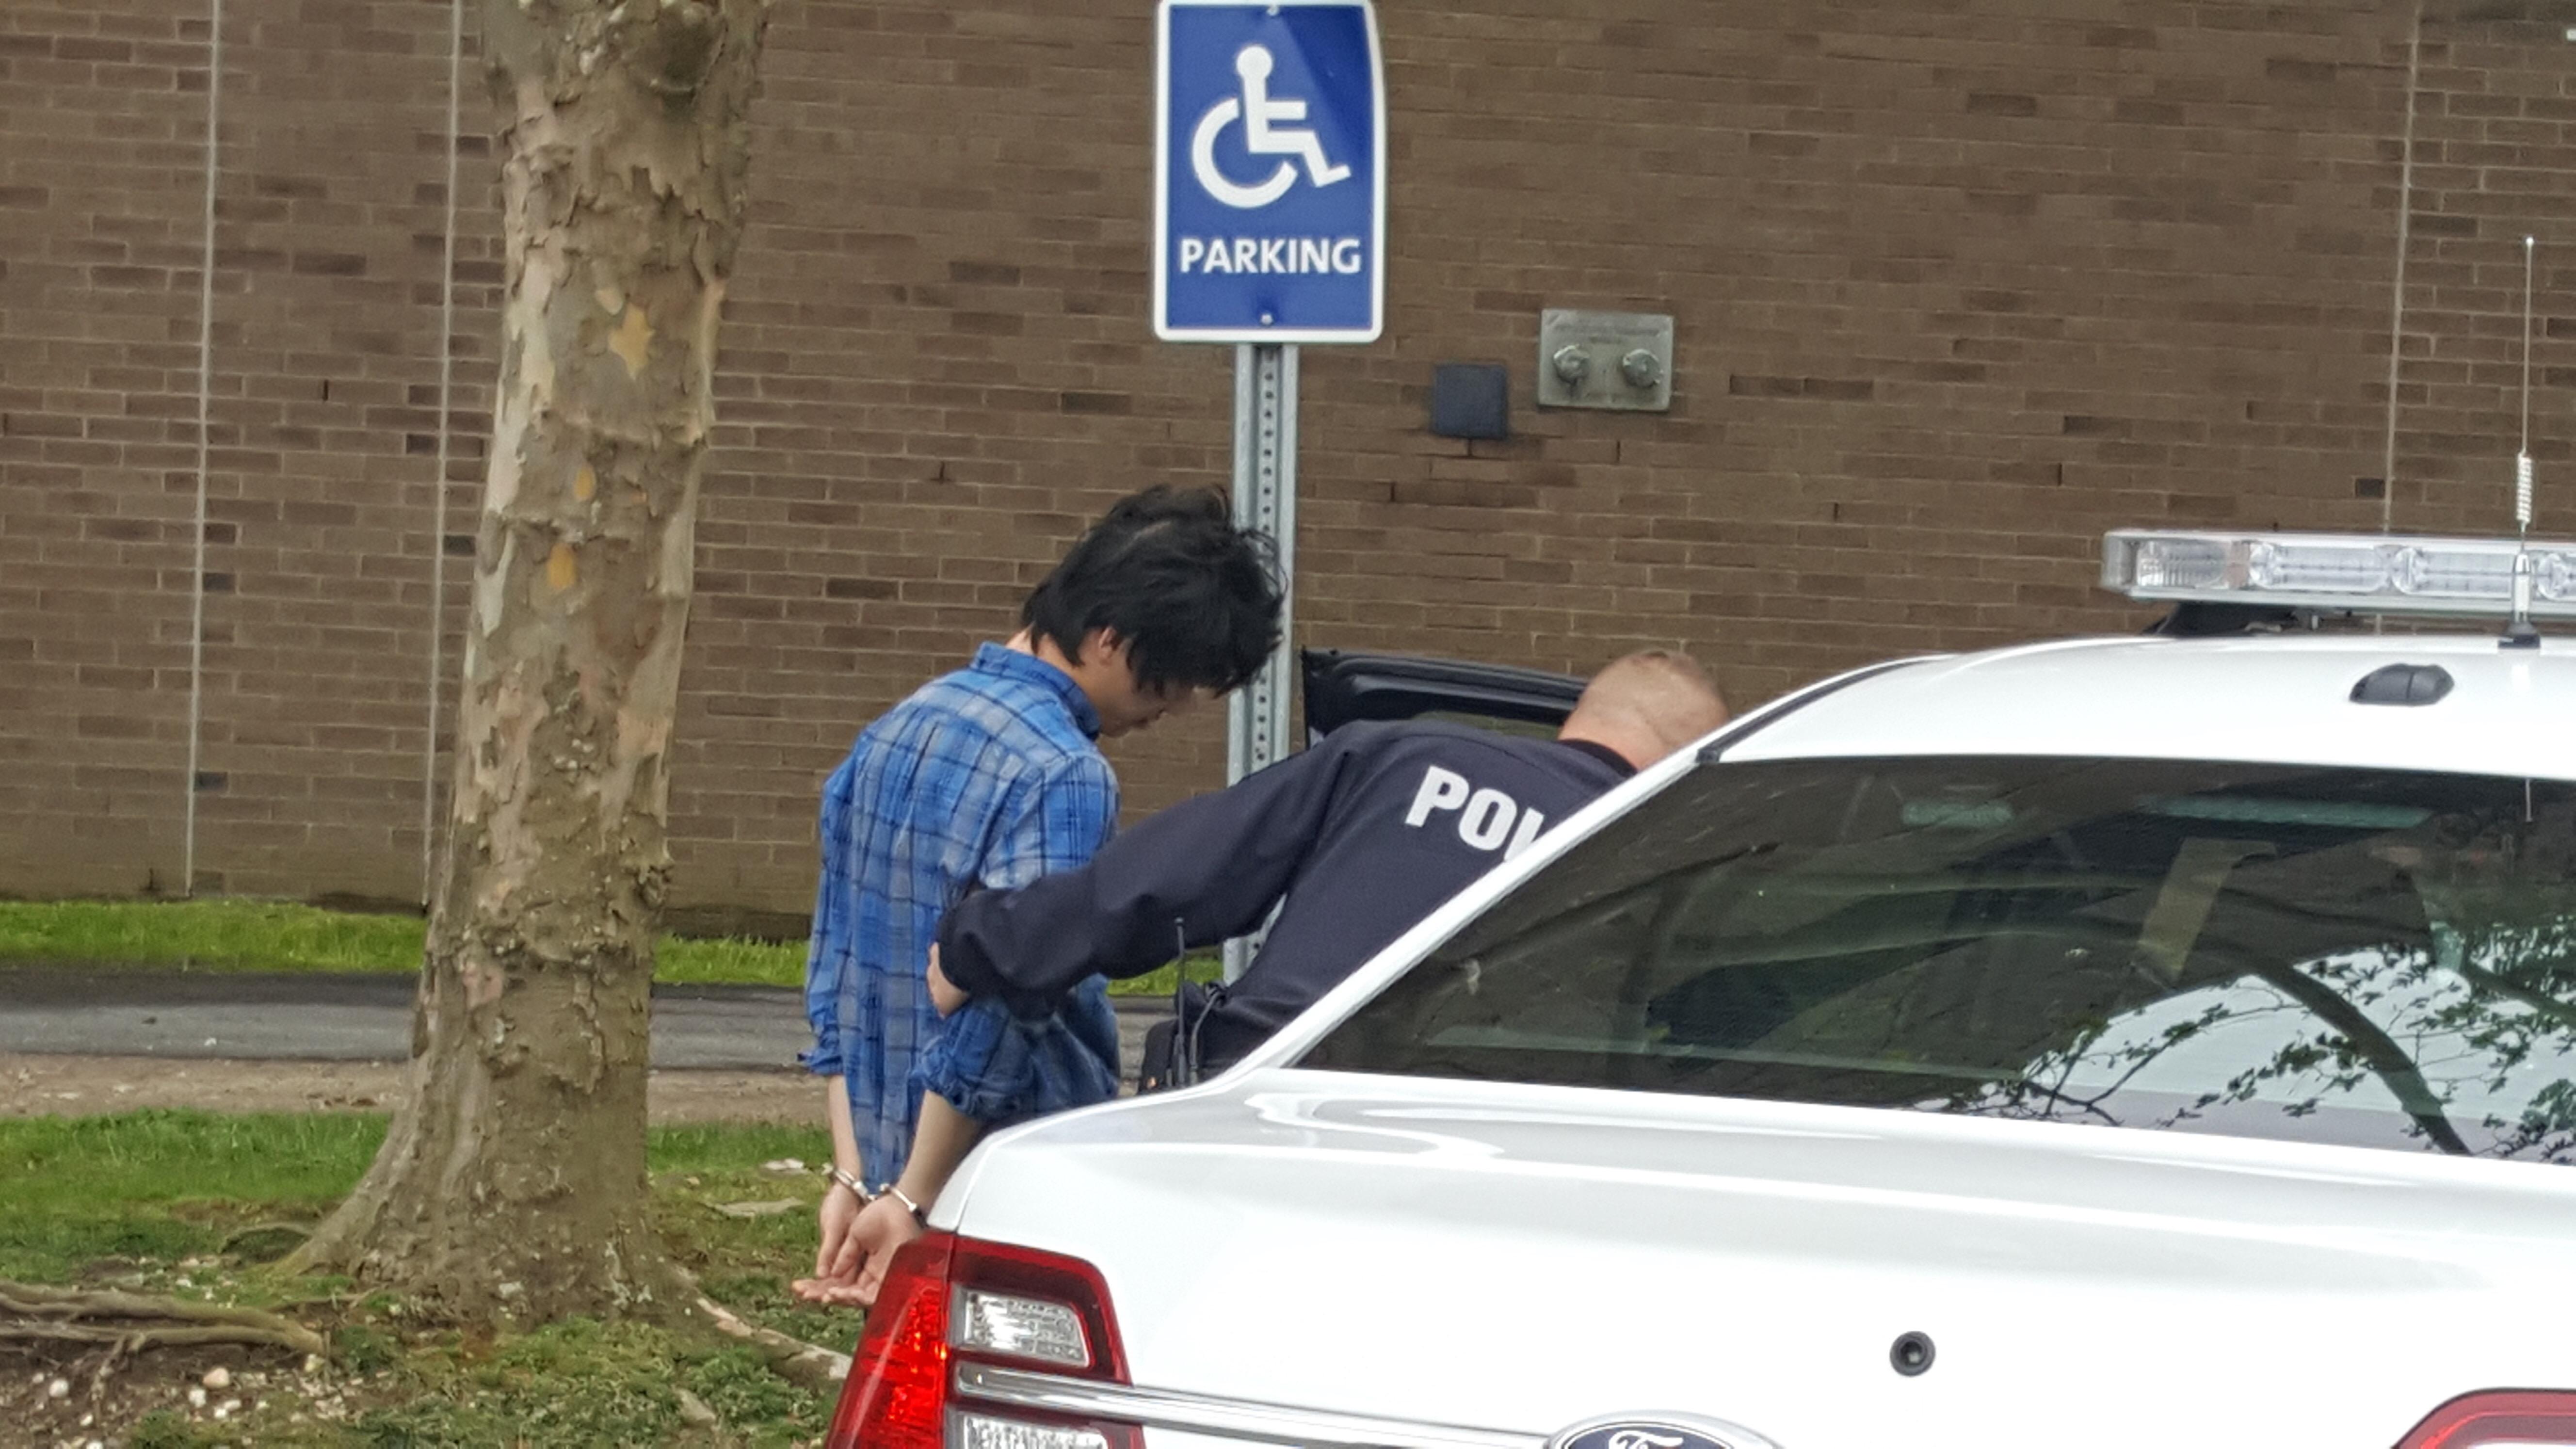 An individual taken into custody outside of the Melville Library. SKYLER GILBERT/THE STATESMAN